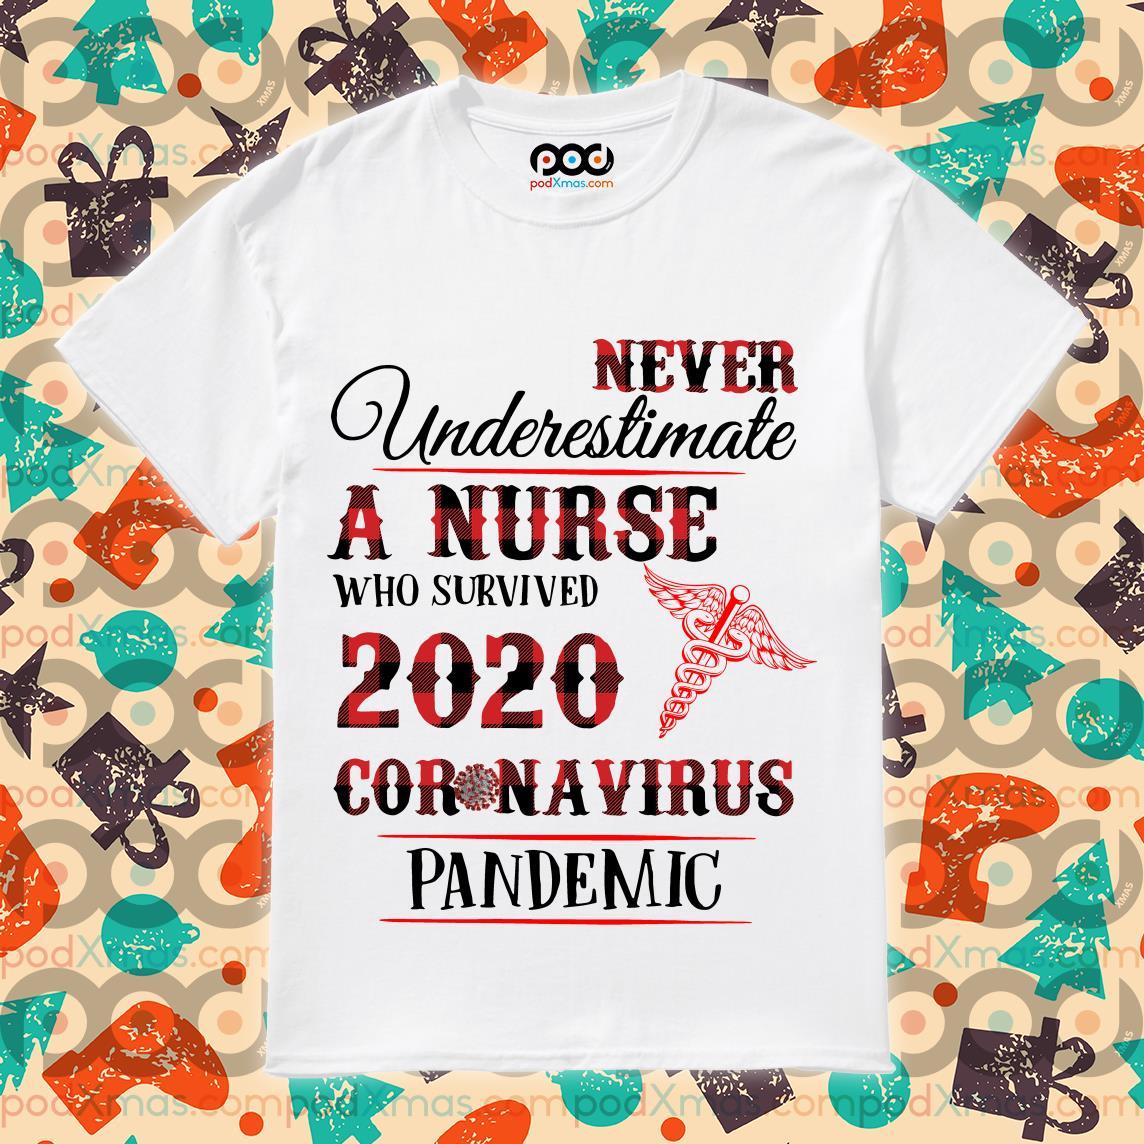 Nurse who survived 2020 coronavirus pandemic shirt